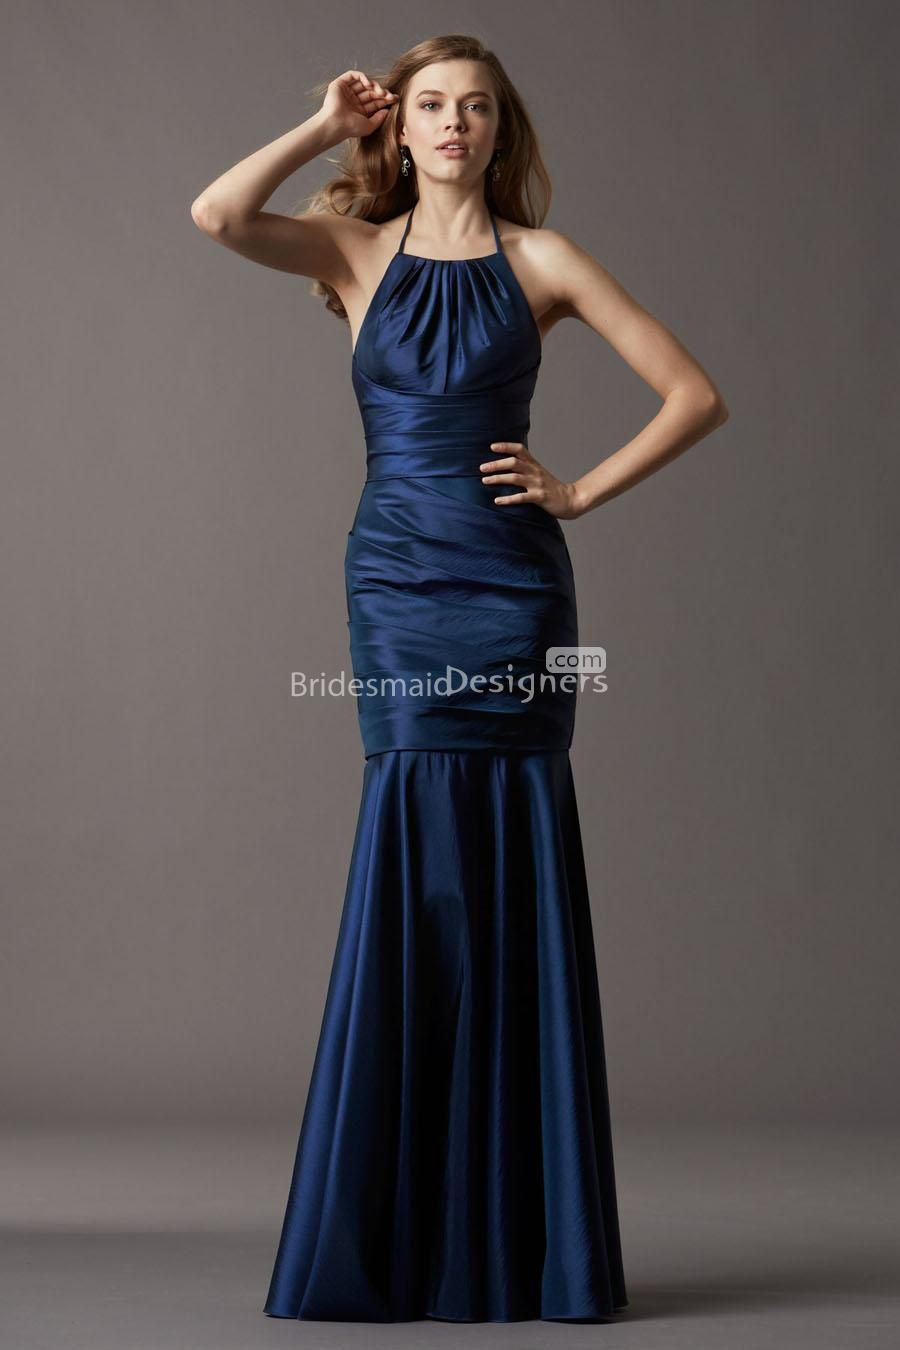 navy wedding dress halter mermaid sleeveless navy blue long drop waist bridesmaid dress US 00